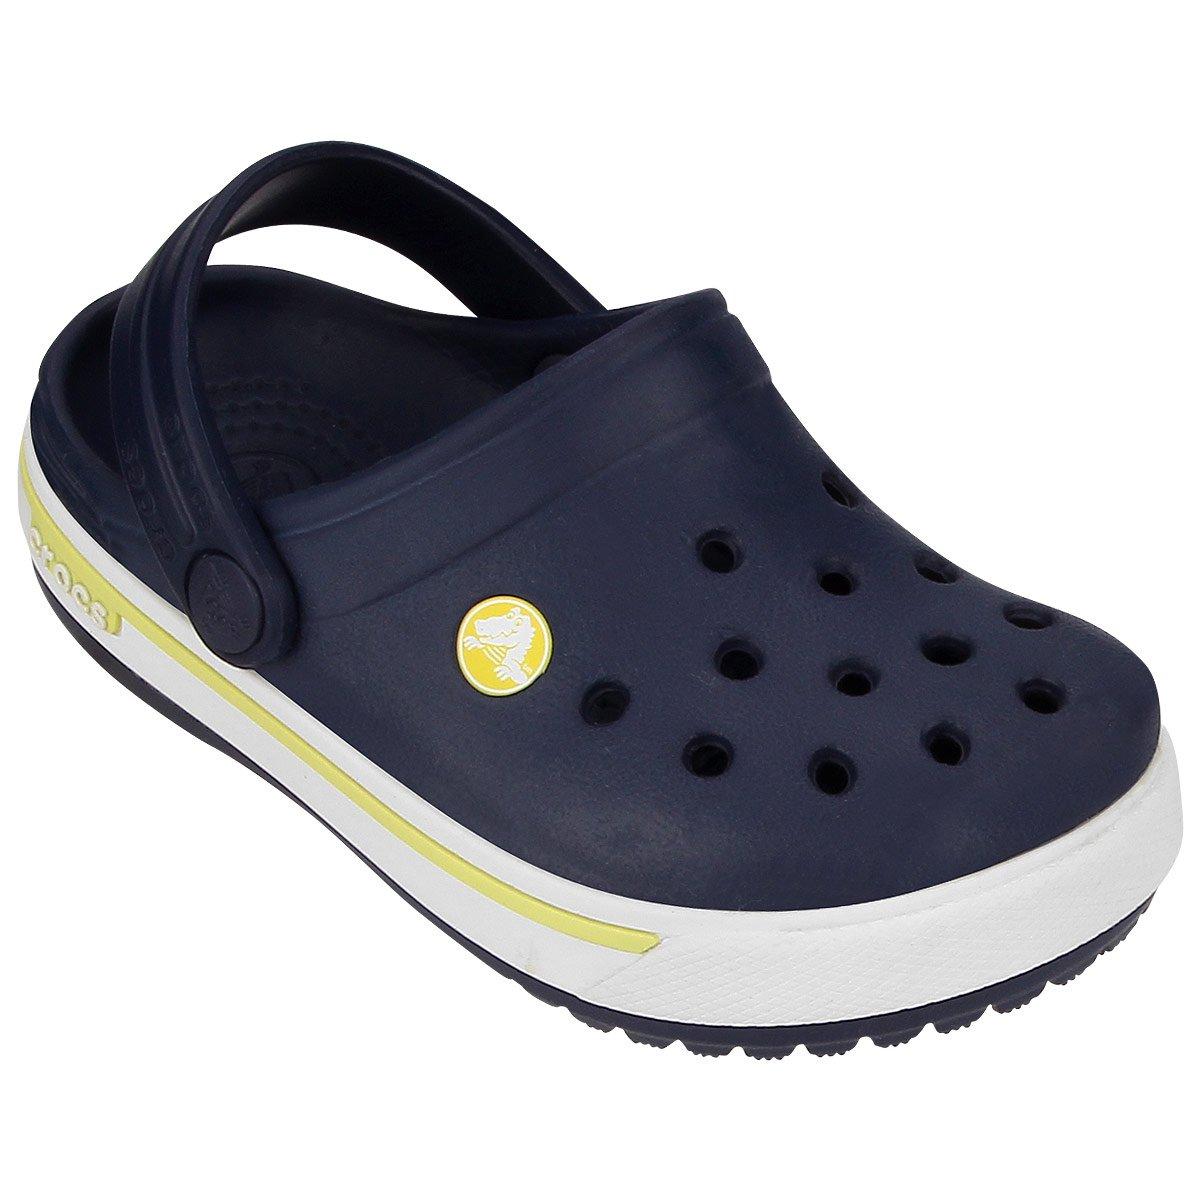 21b6a37f121a4 Sandália Crocs Infantil Crocband 2.5 | Zattini